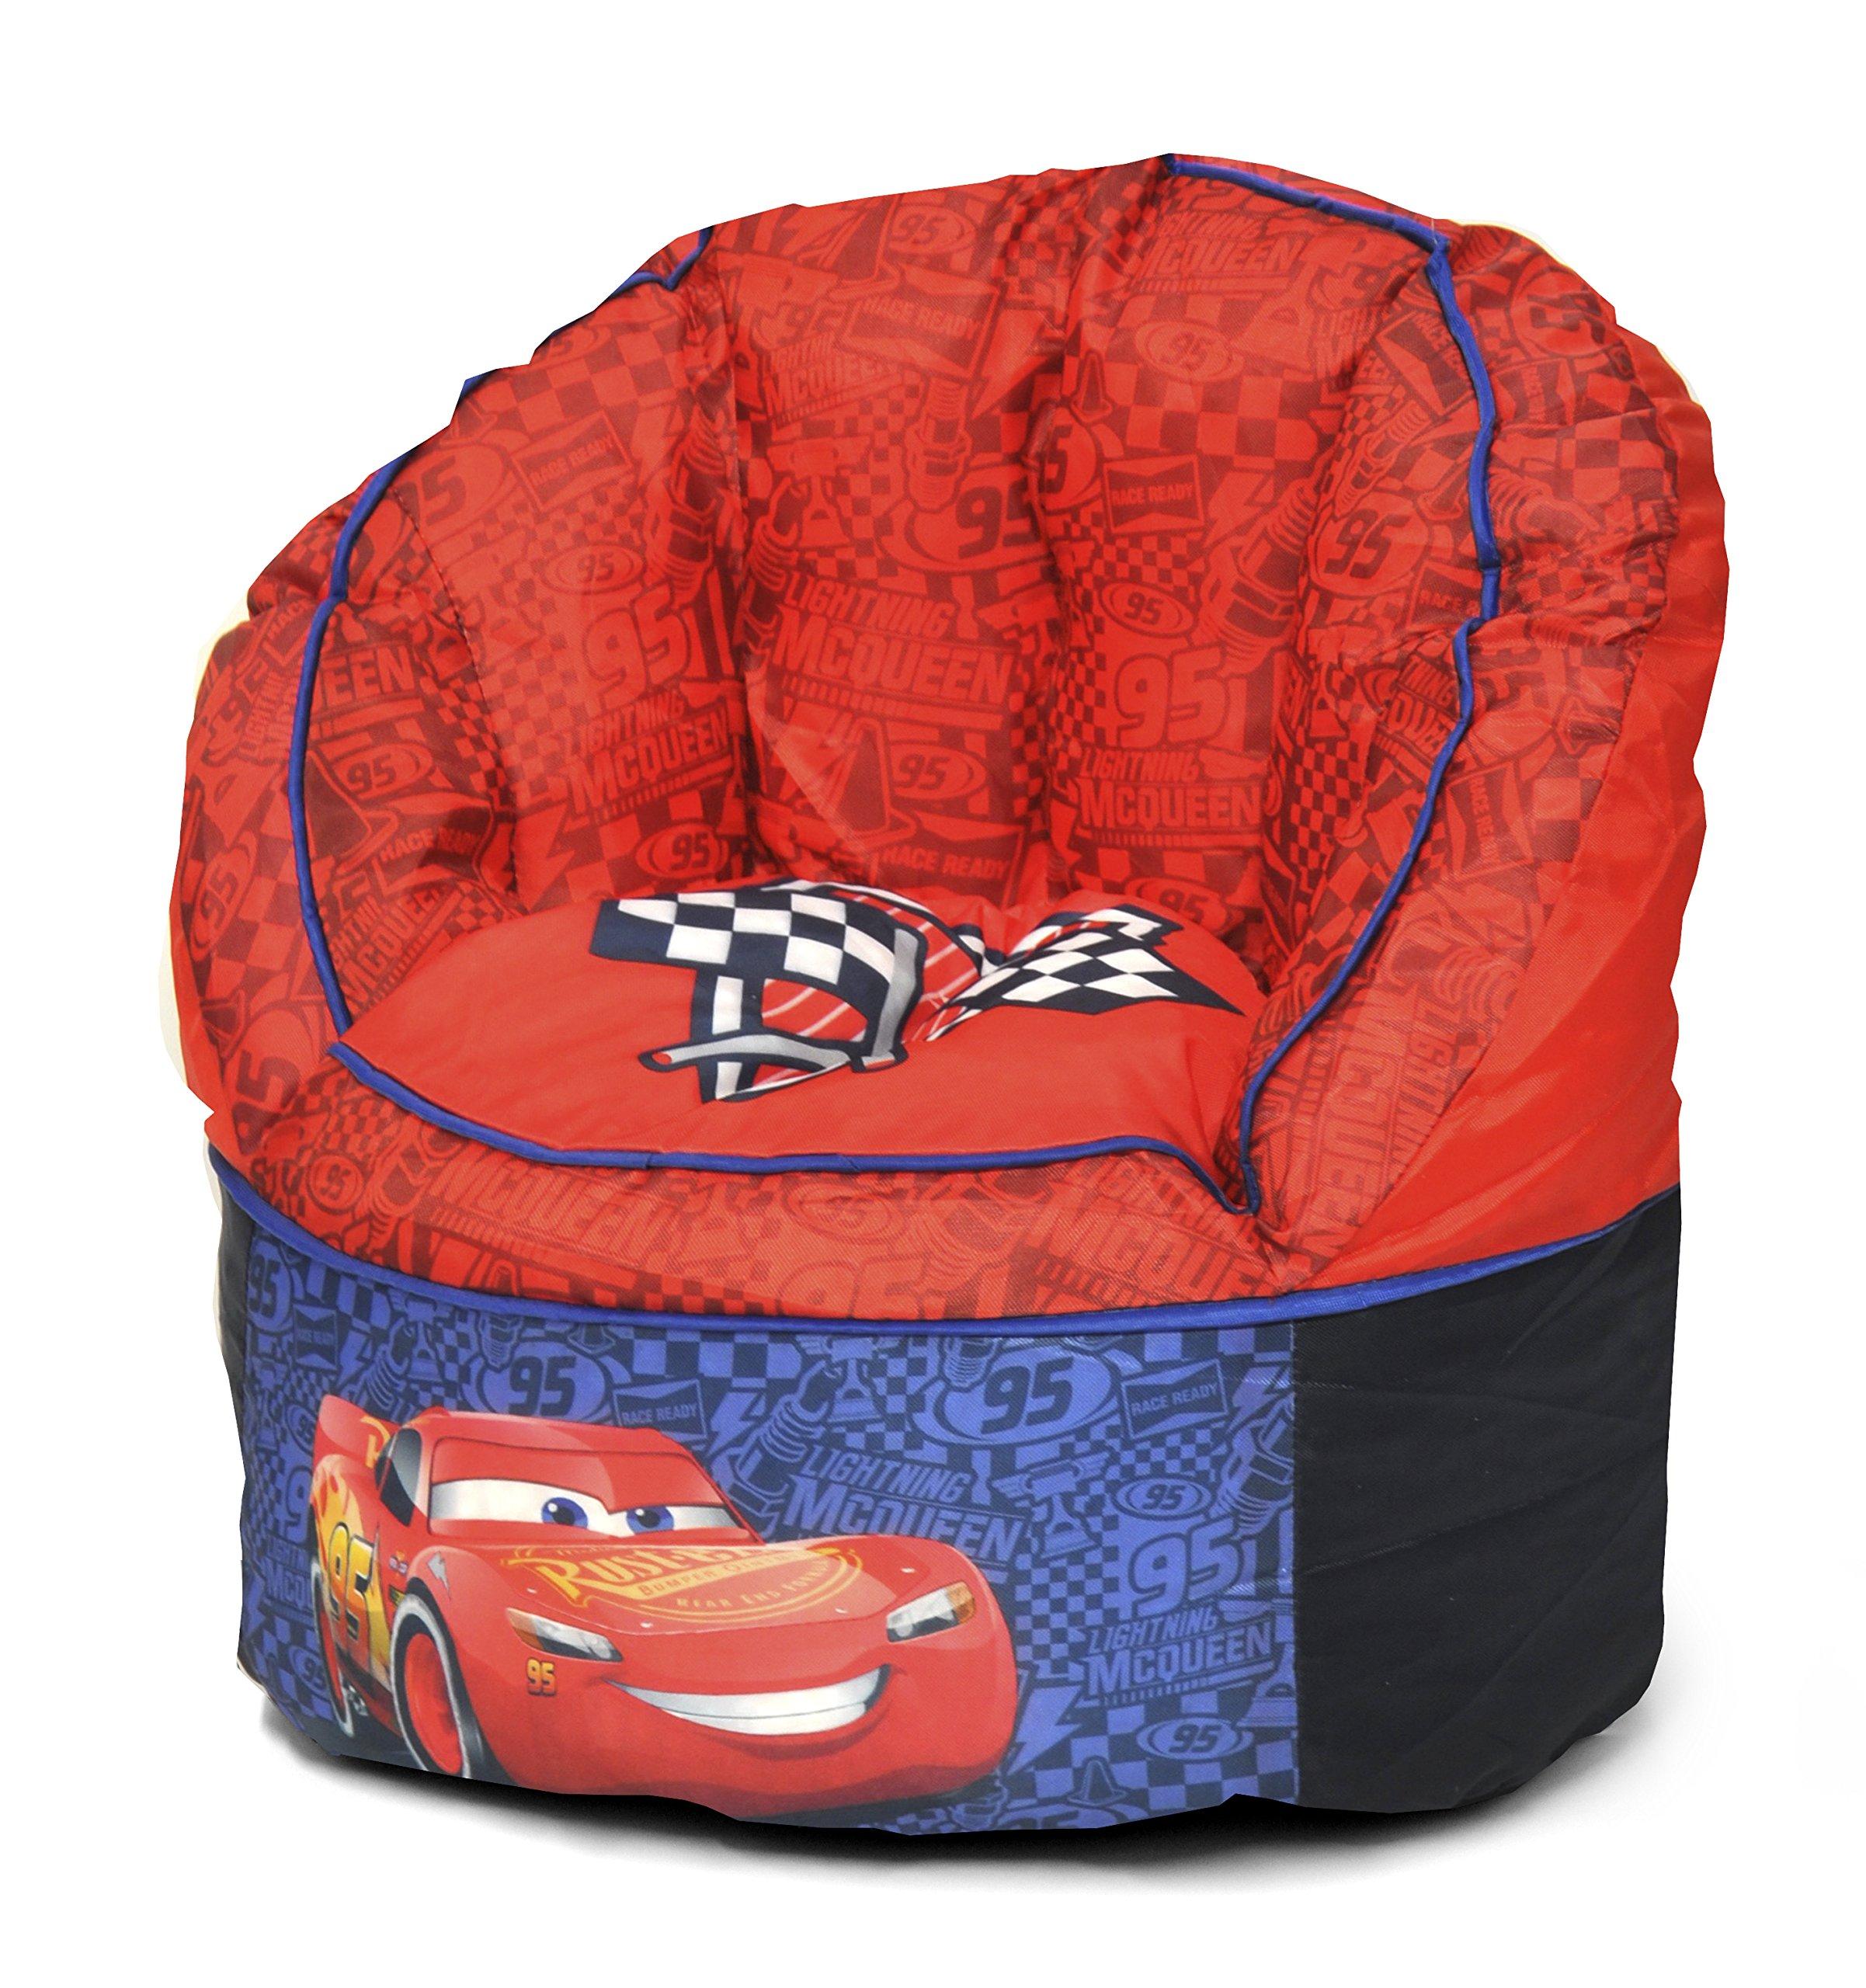 Disney Cars Toddler Bean Bag Chair, Red by Disney